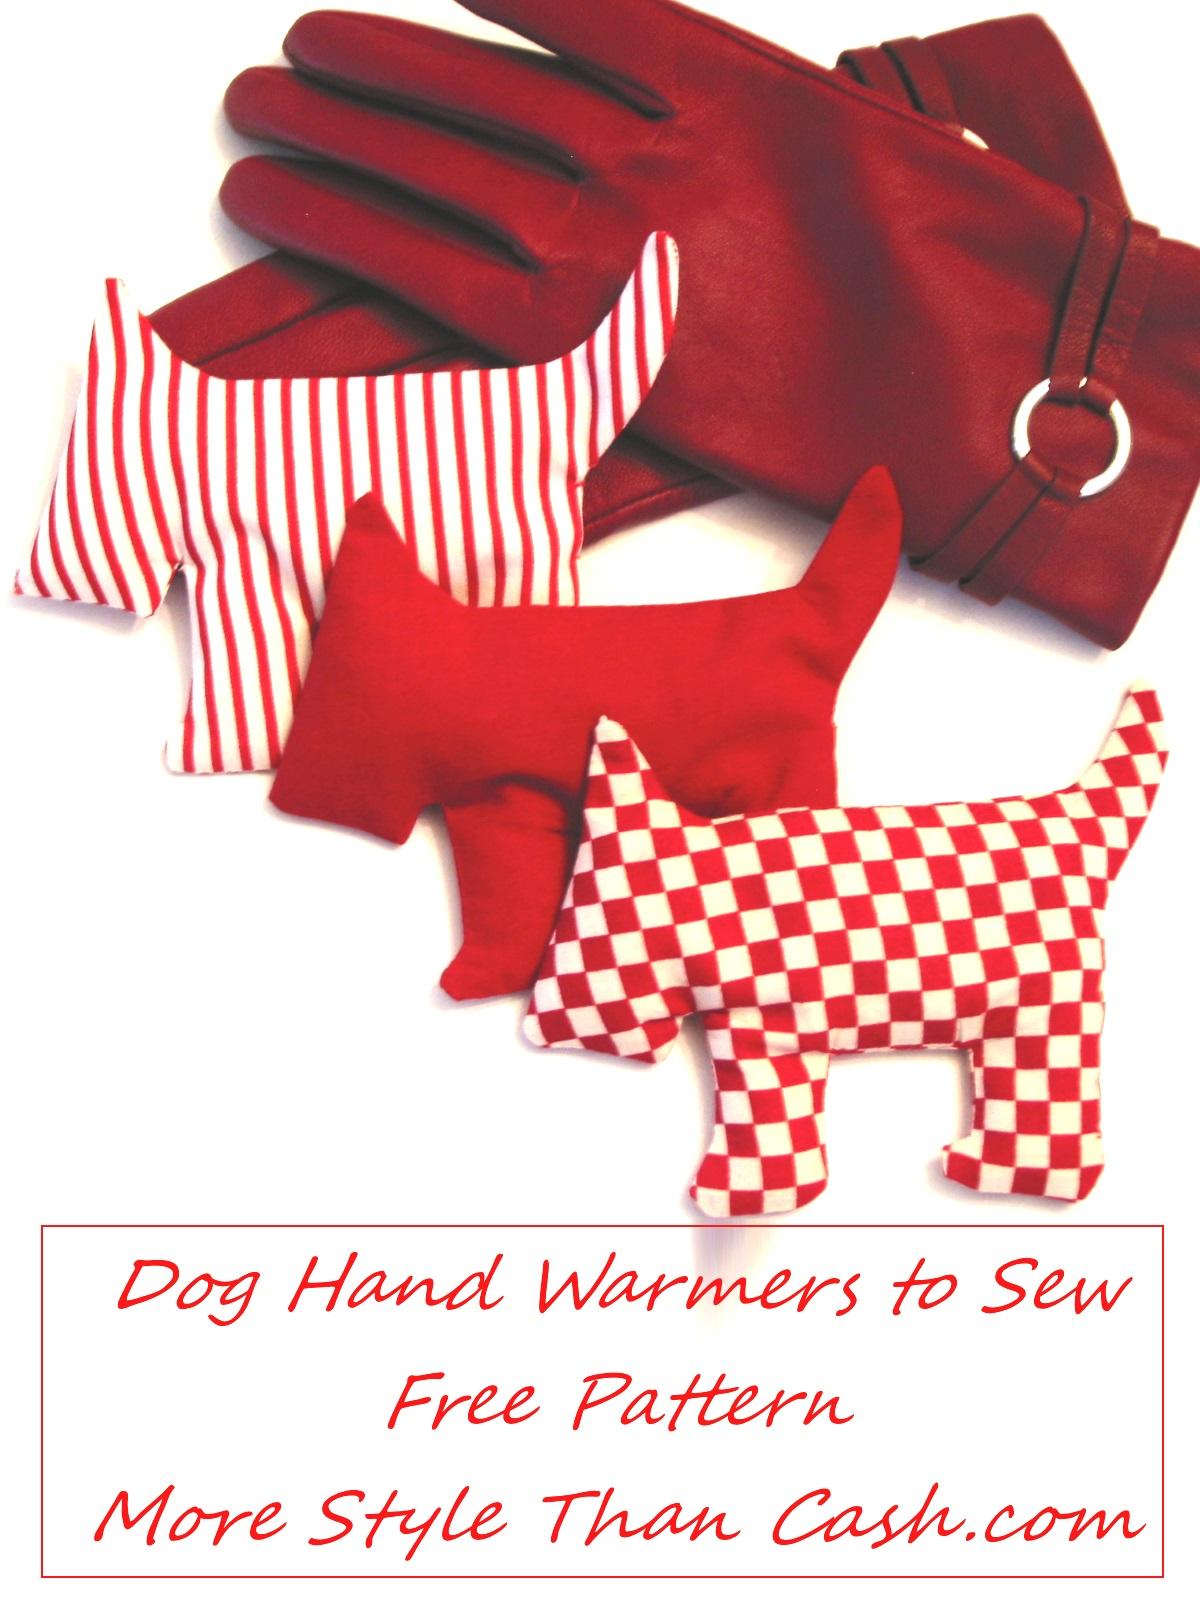 Dog Hand Warmers to Make.